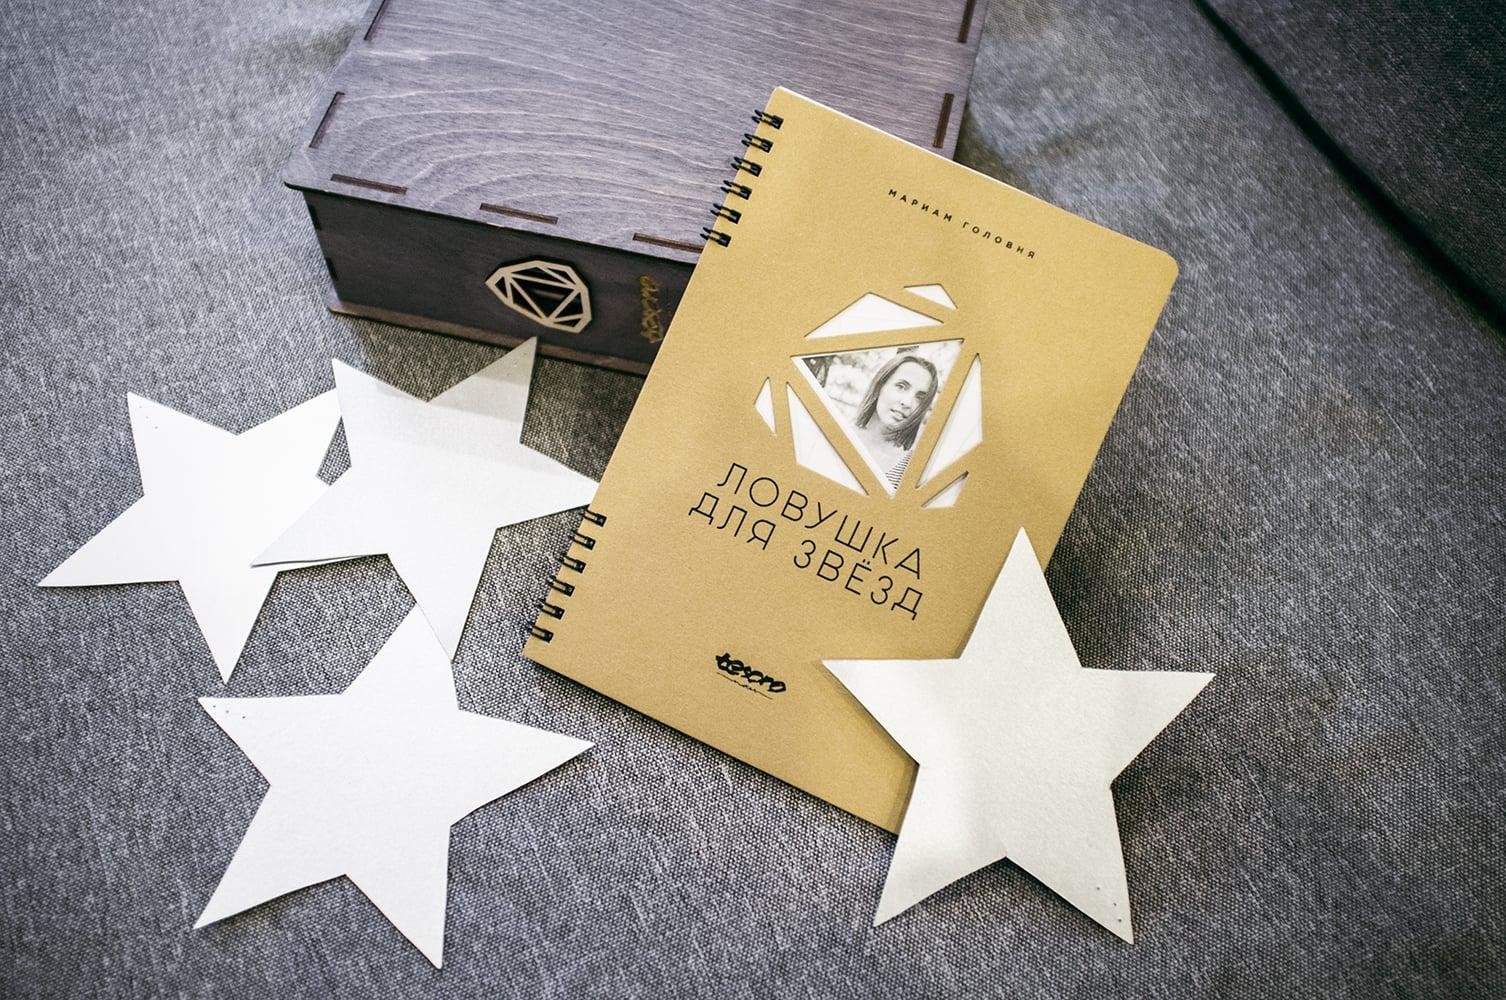 Ловушка для звёзд | Домашнее издательство Skrebeyko